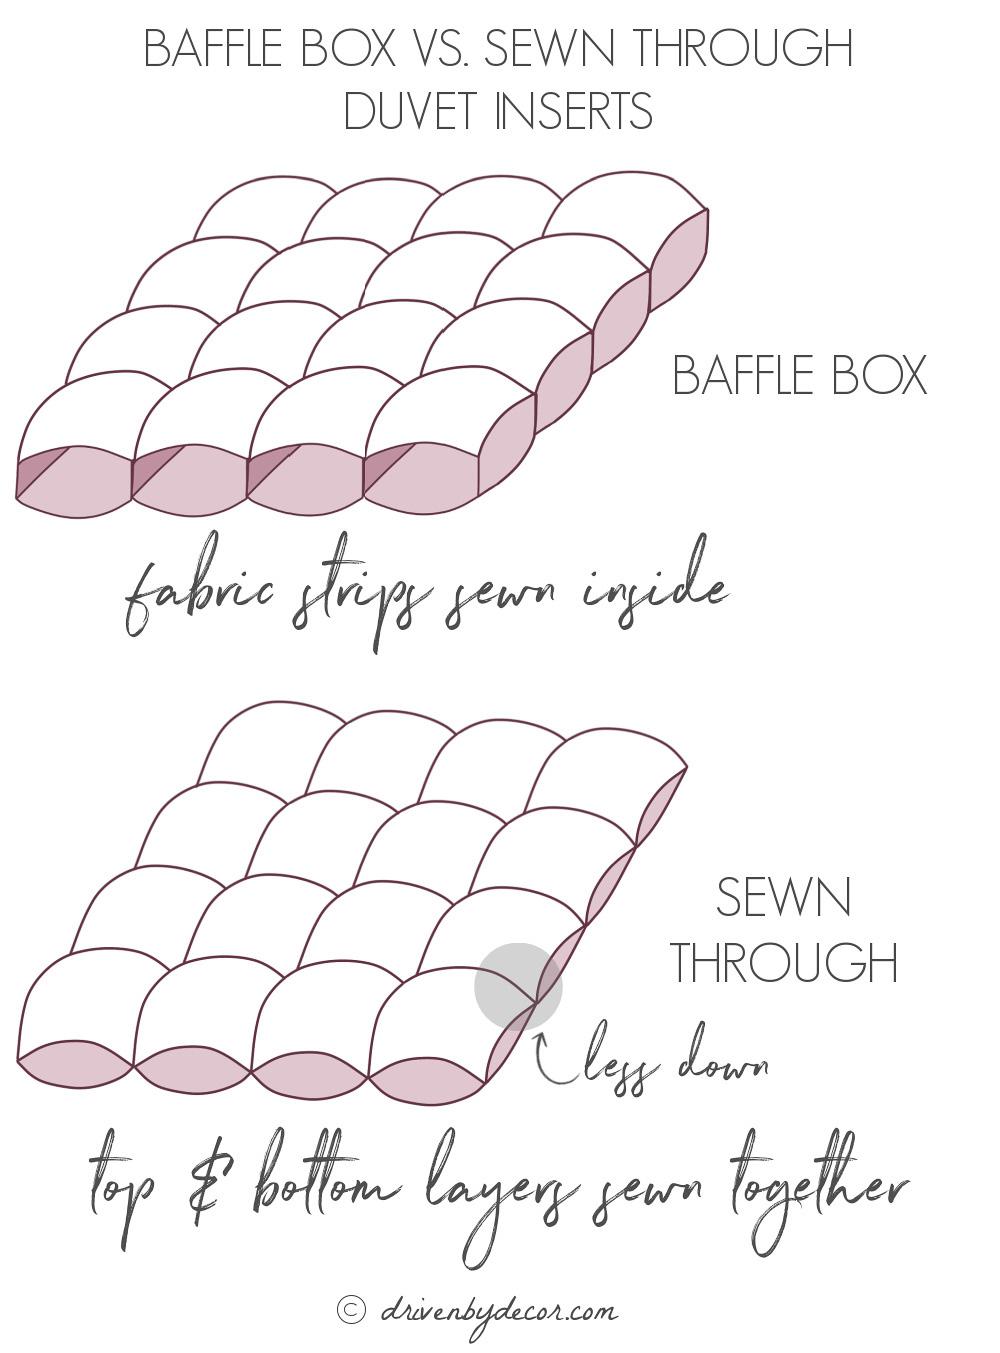 Baffle box vs sewn through duvet inserts - how to choose the best duvet insert!